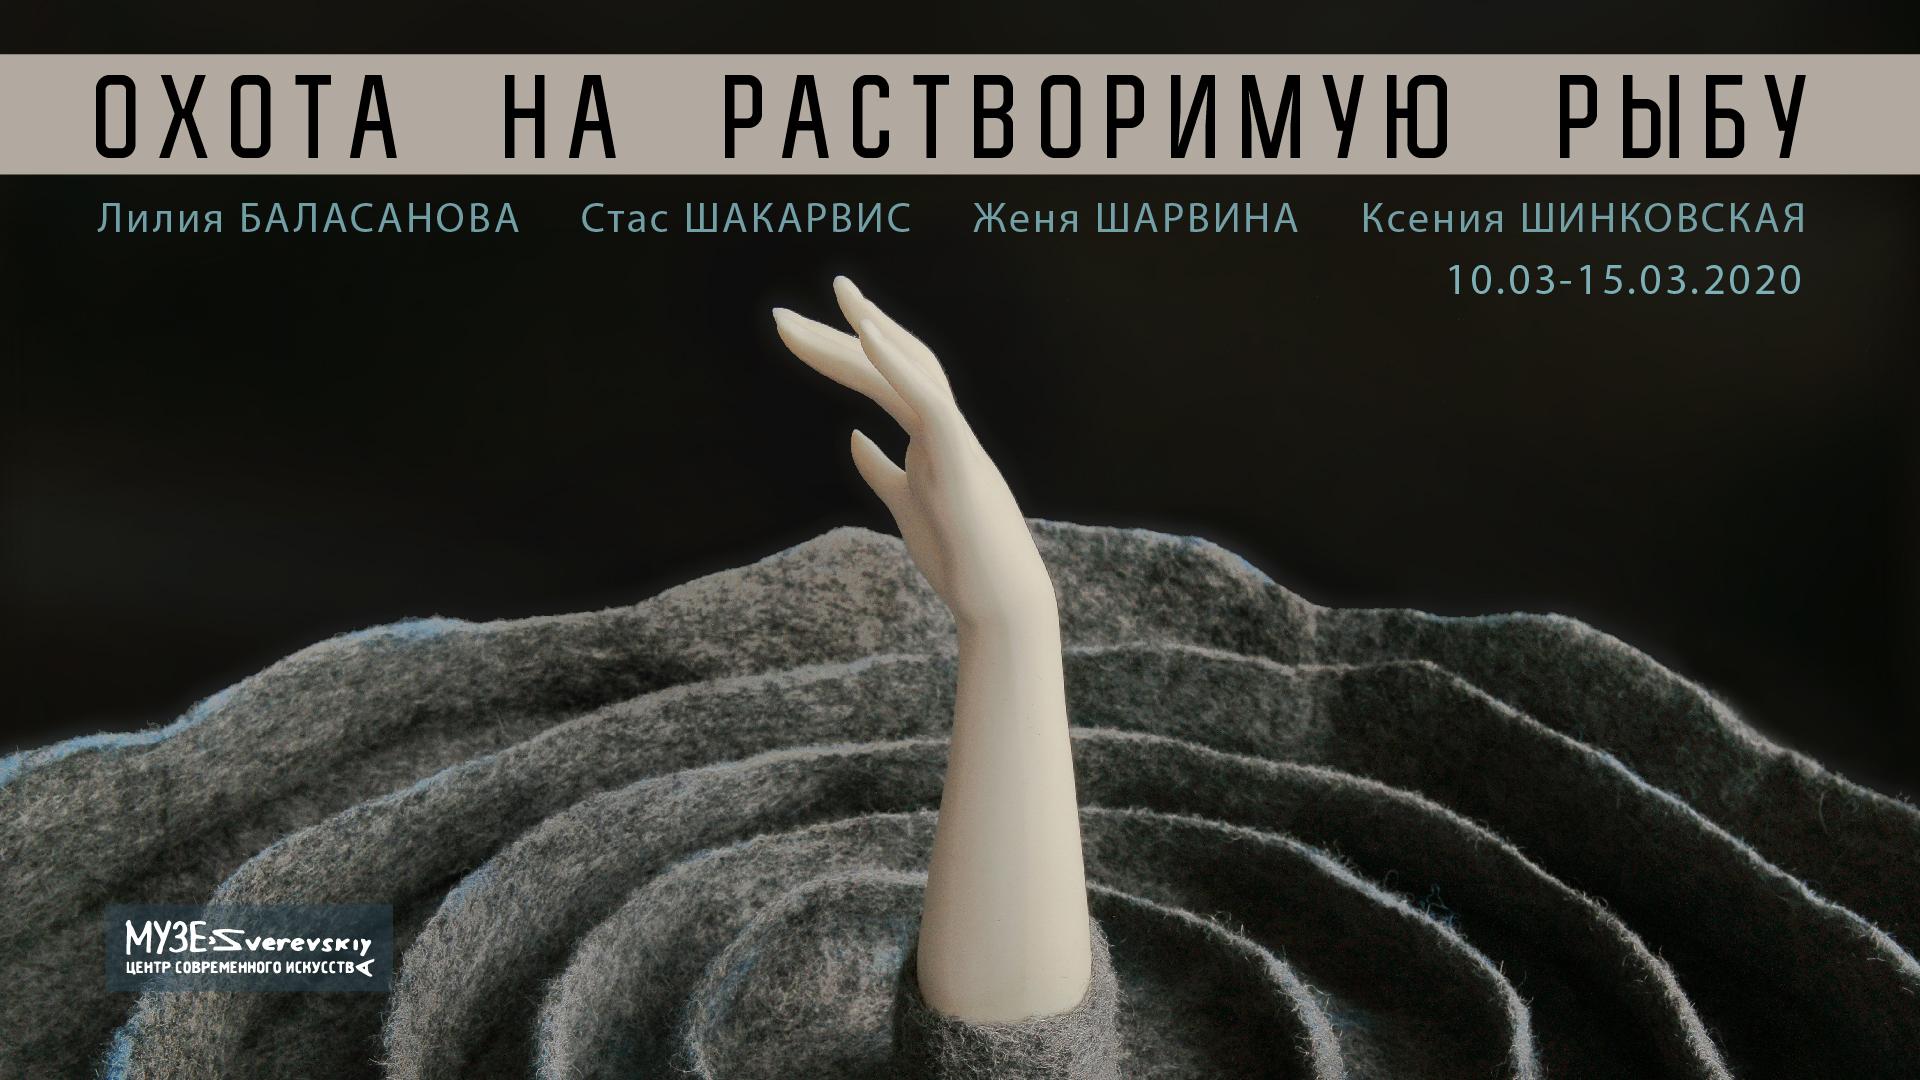 Охота_на_растворимую_рыбу_афиша_фб_v011